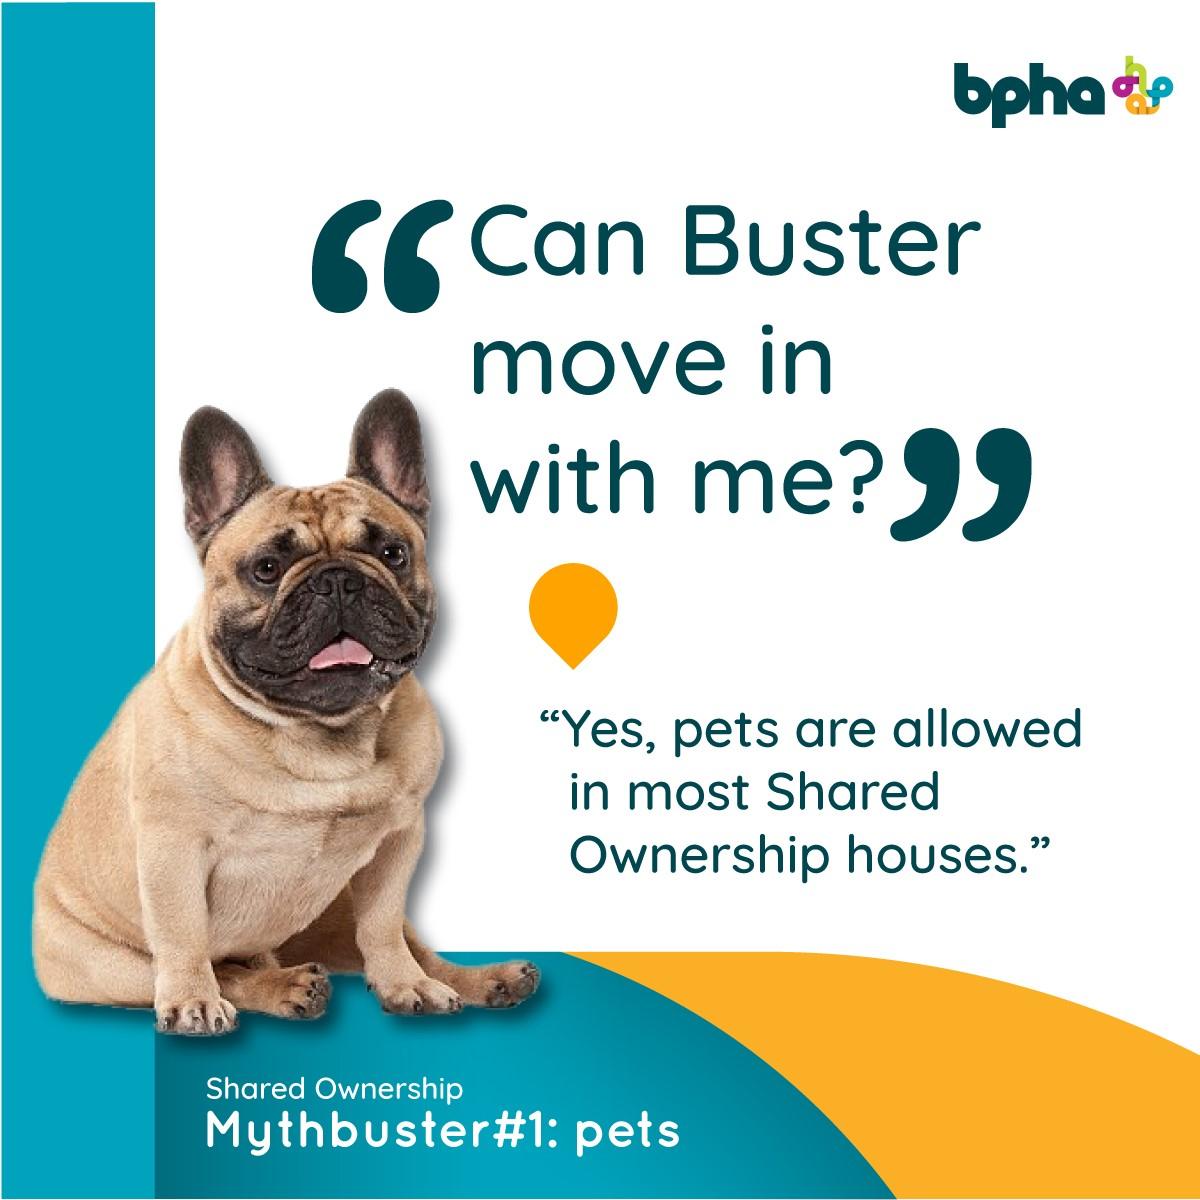 Shared Ownership mythbusters - bpha